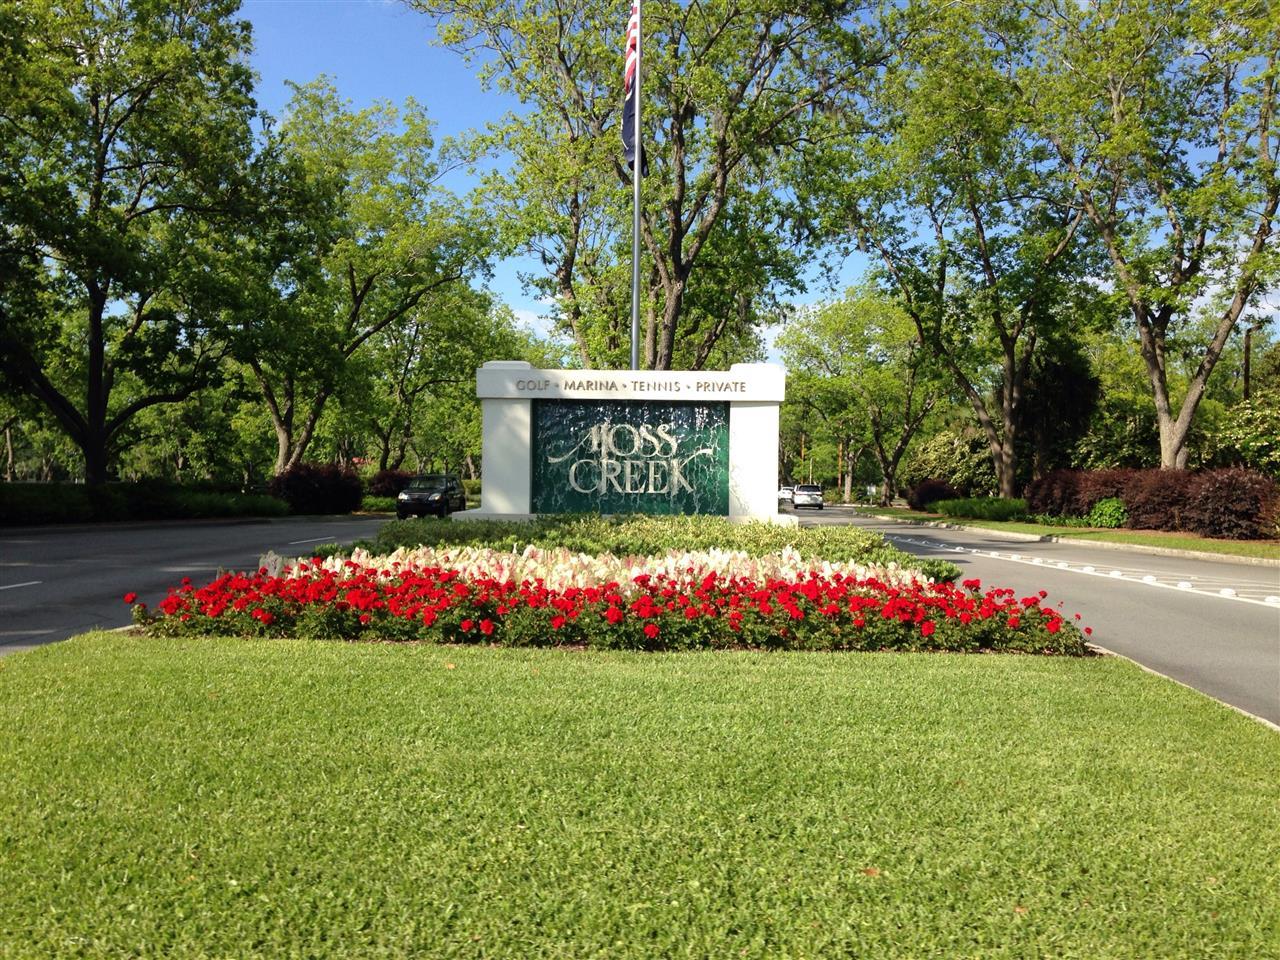 Moss Creek Planation Hilton Head Island SC, springtime flowers at the entrance